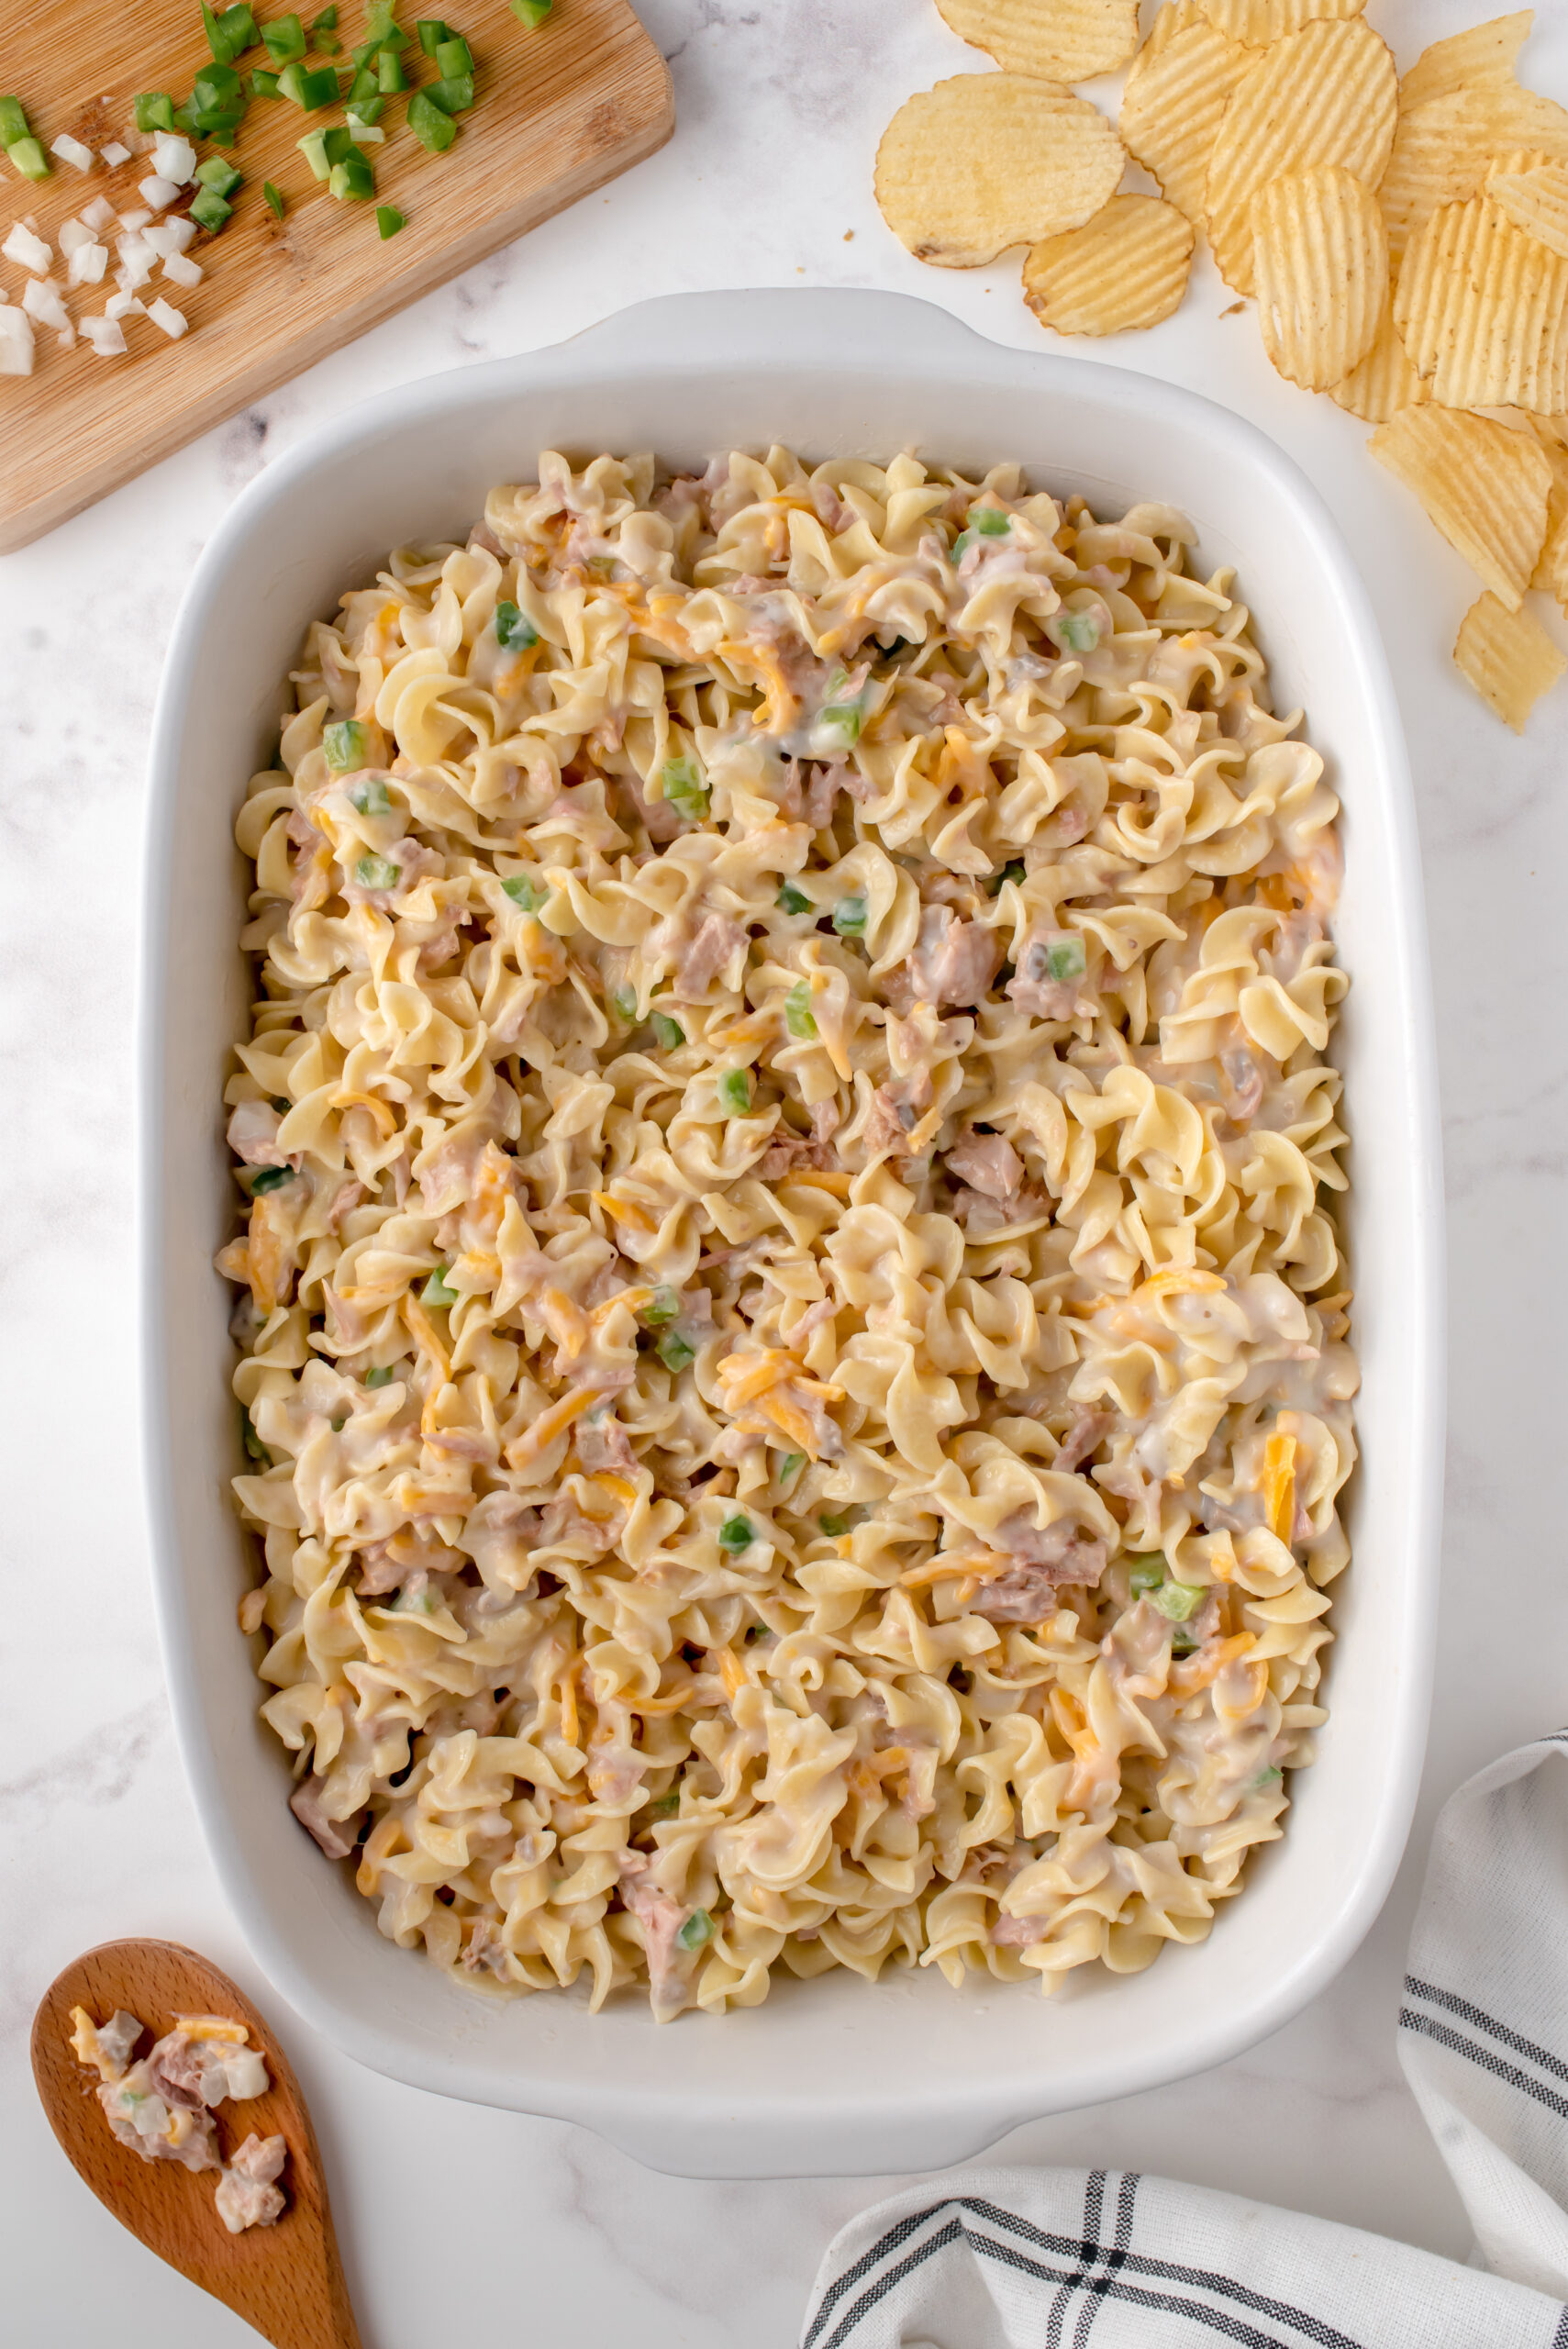 Old Fashioned Tuna Noodle Casserole - This Farm Girl Cooks